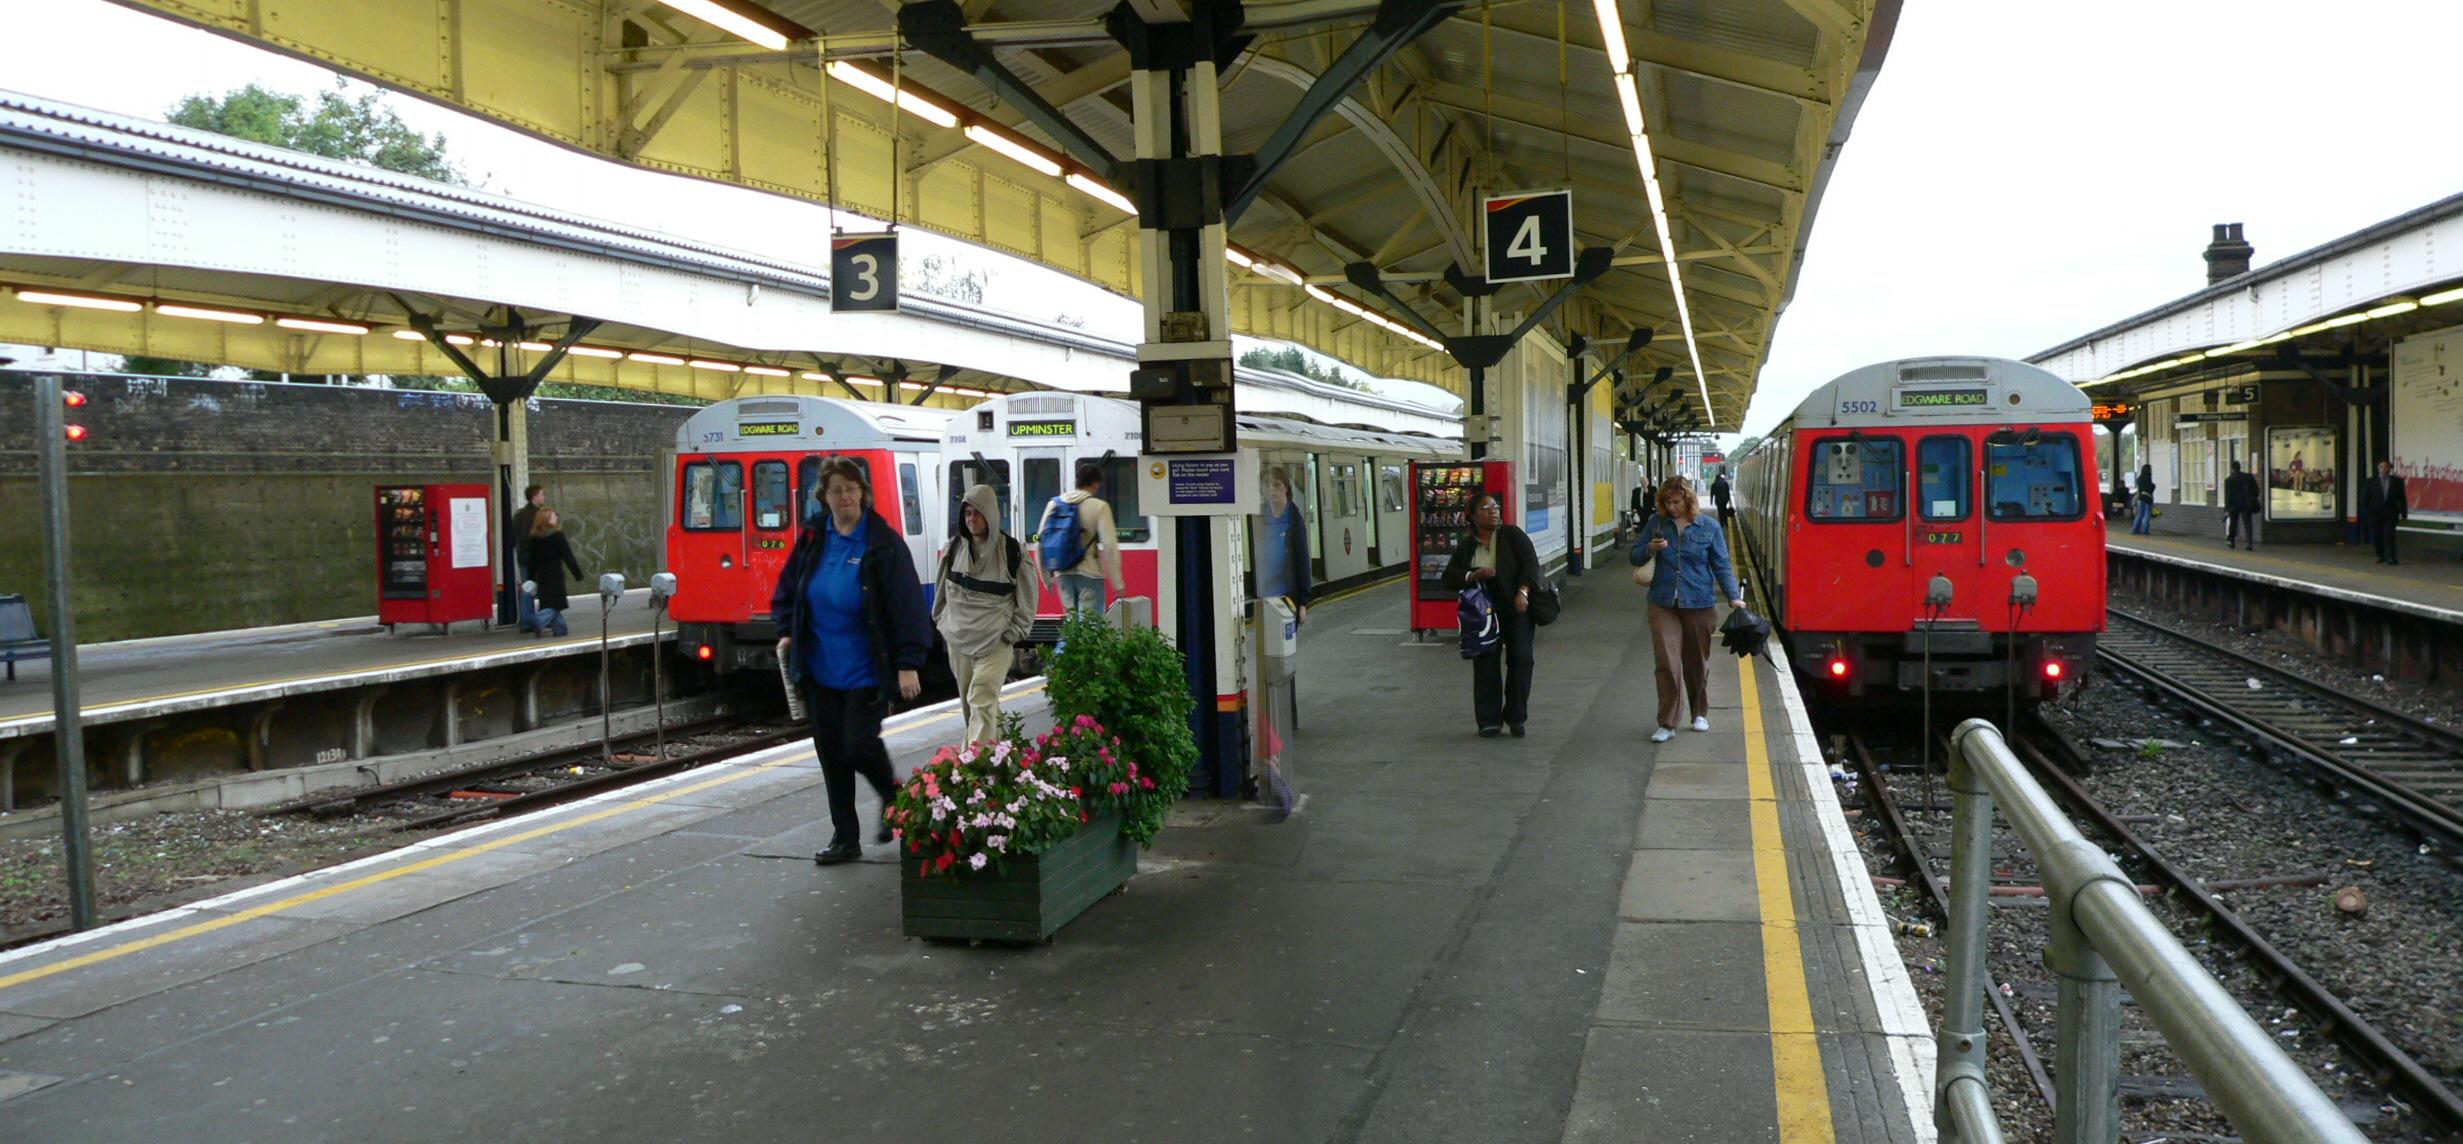 Wimbledon_station_02.jpg